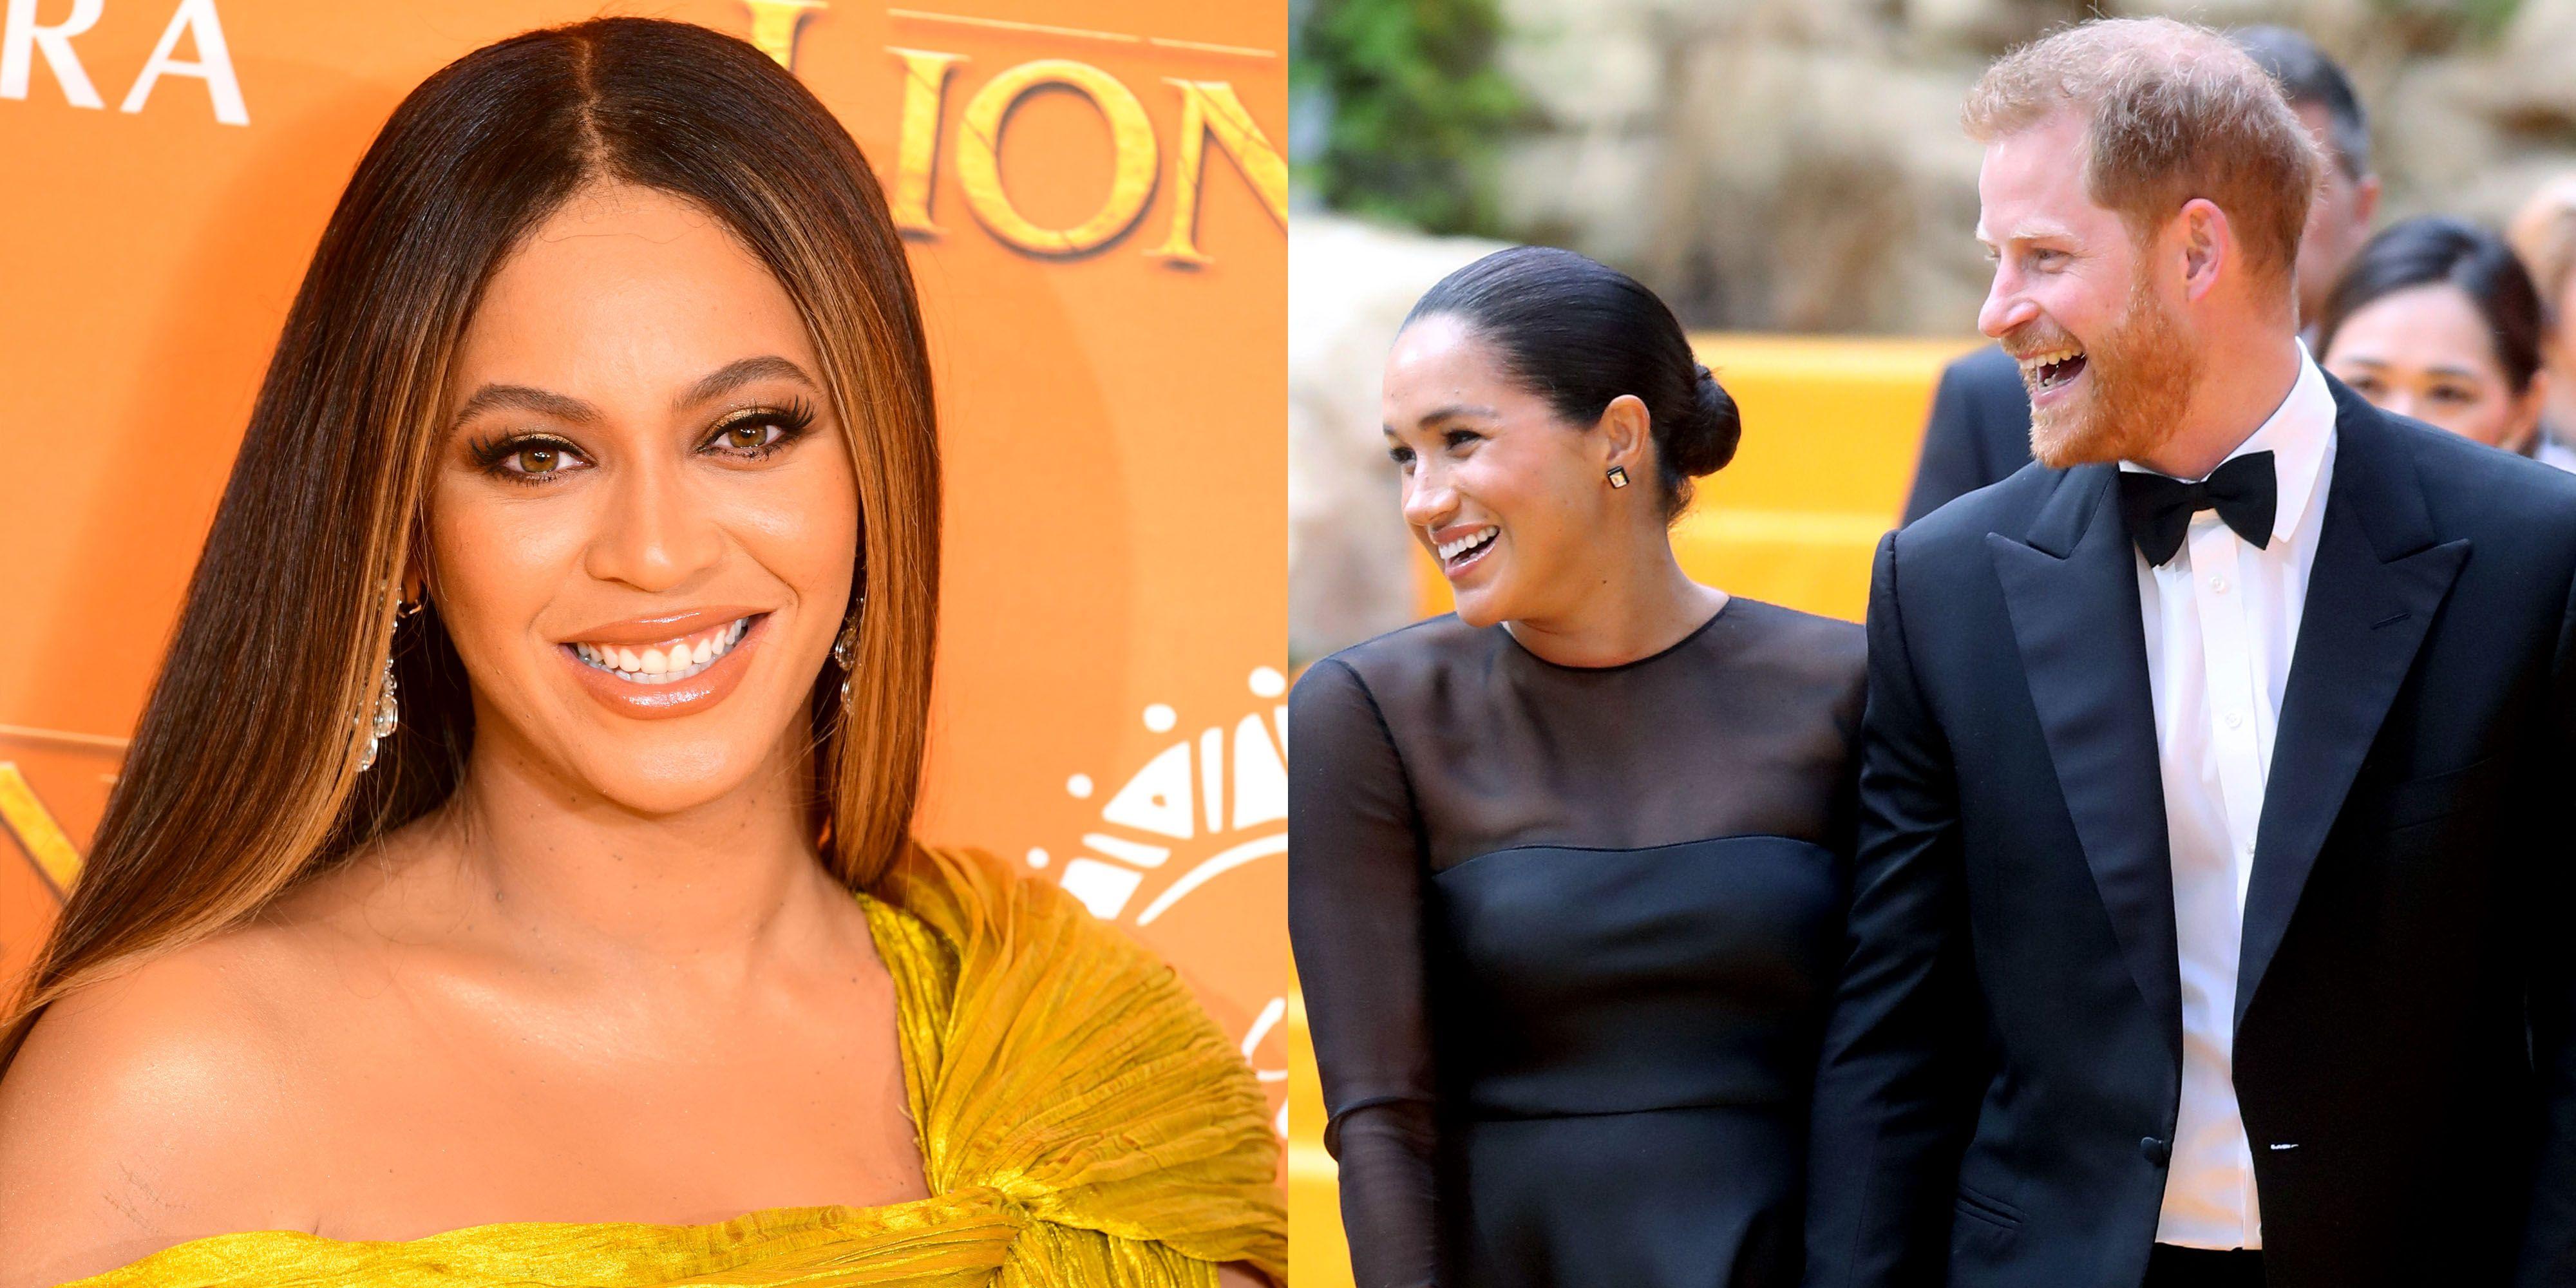 Meghan Markle Meets Beyoncé at 'The Lion King' Premiere in London